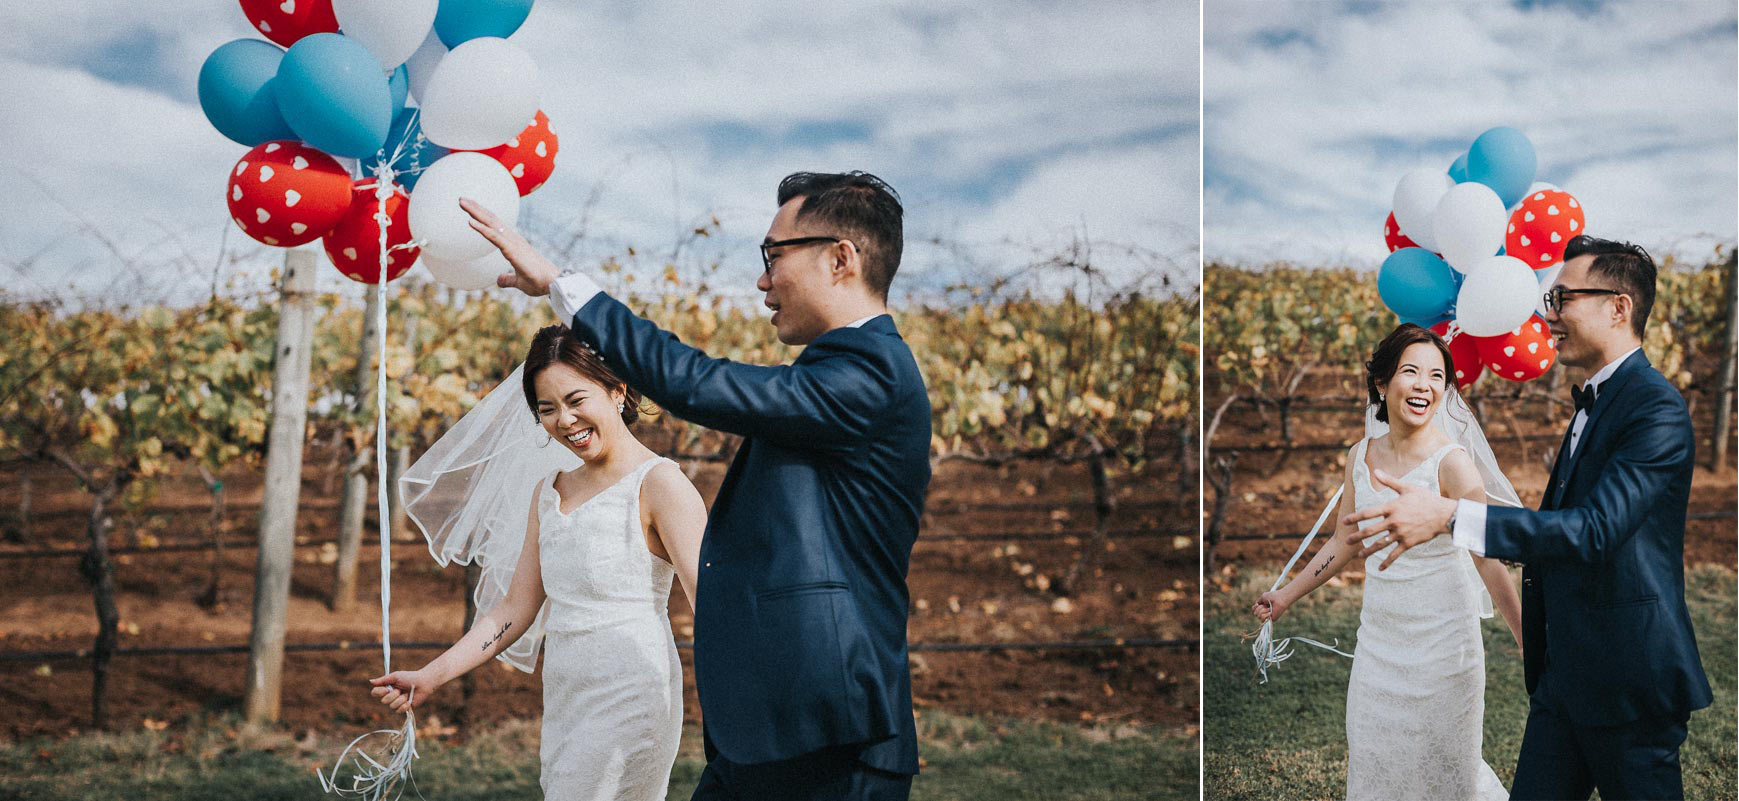 hong-kong-perth-wedding-photographer-39.jpg